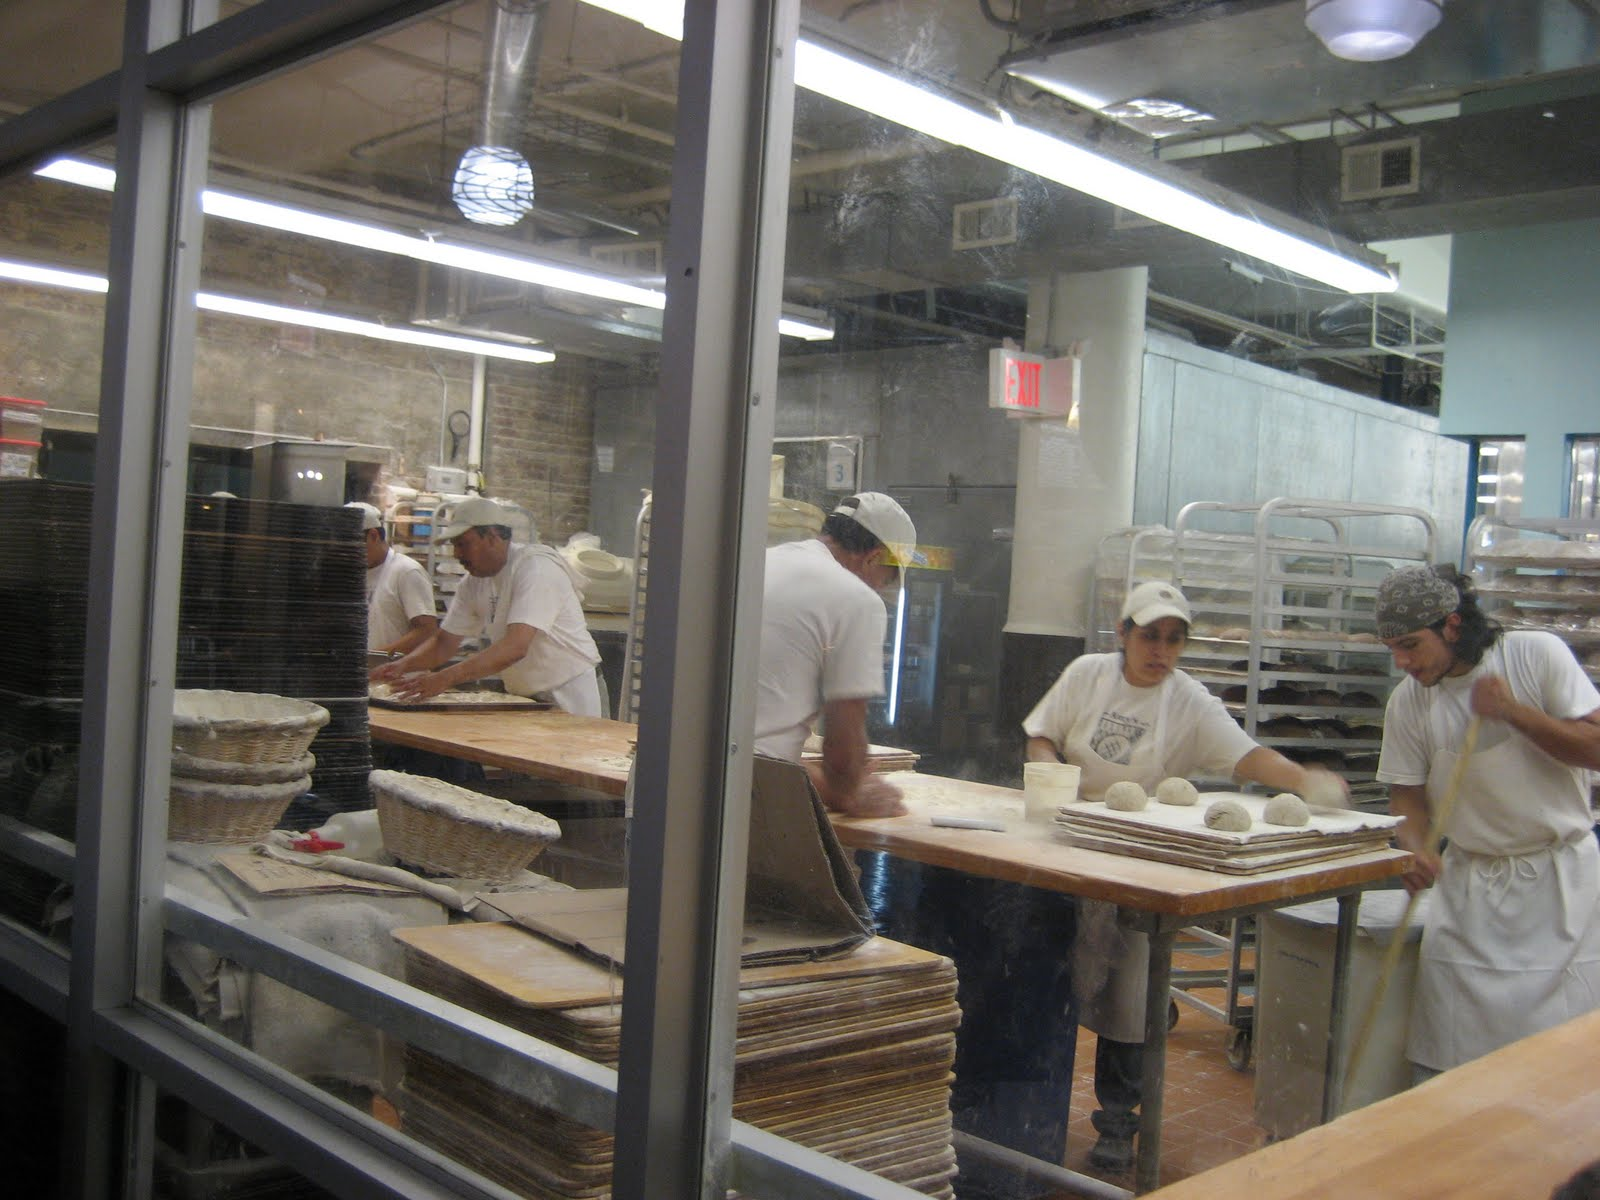 Amy S Bakery Kitchen Nightmares Full Episode